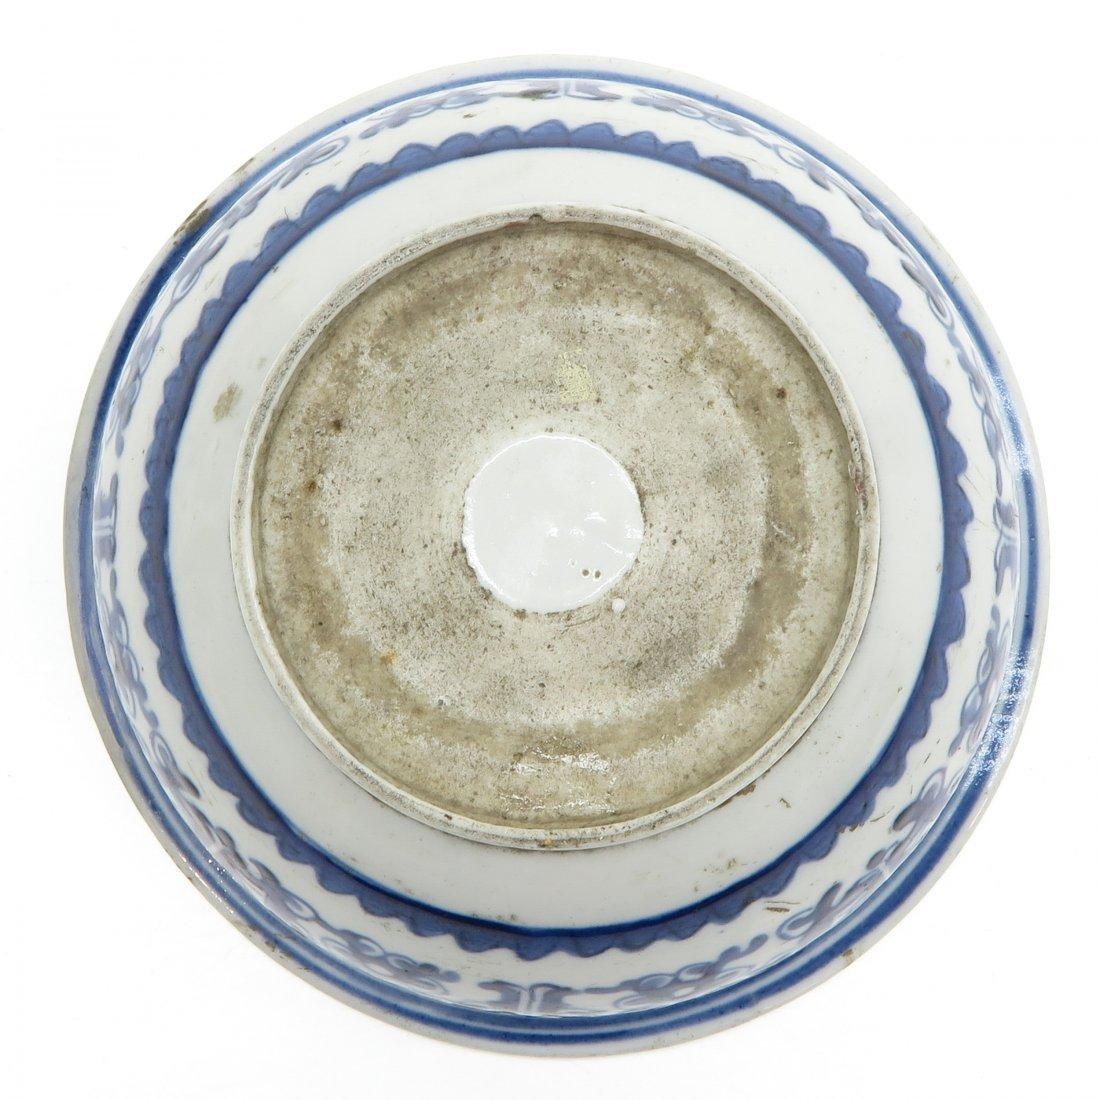 China Porcelain Bowl - 6